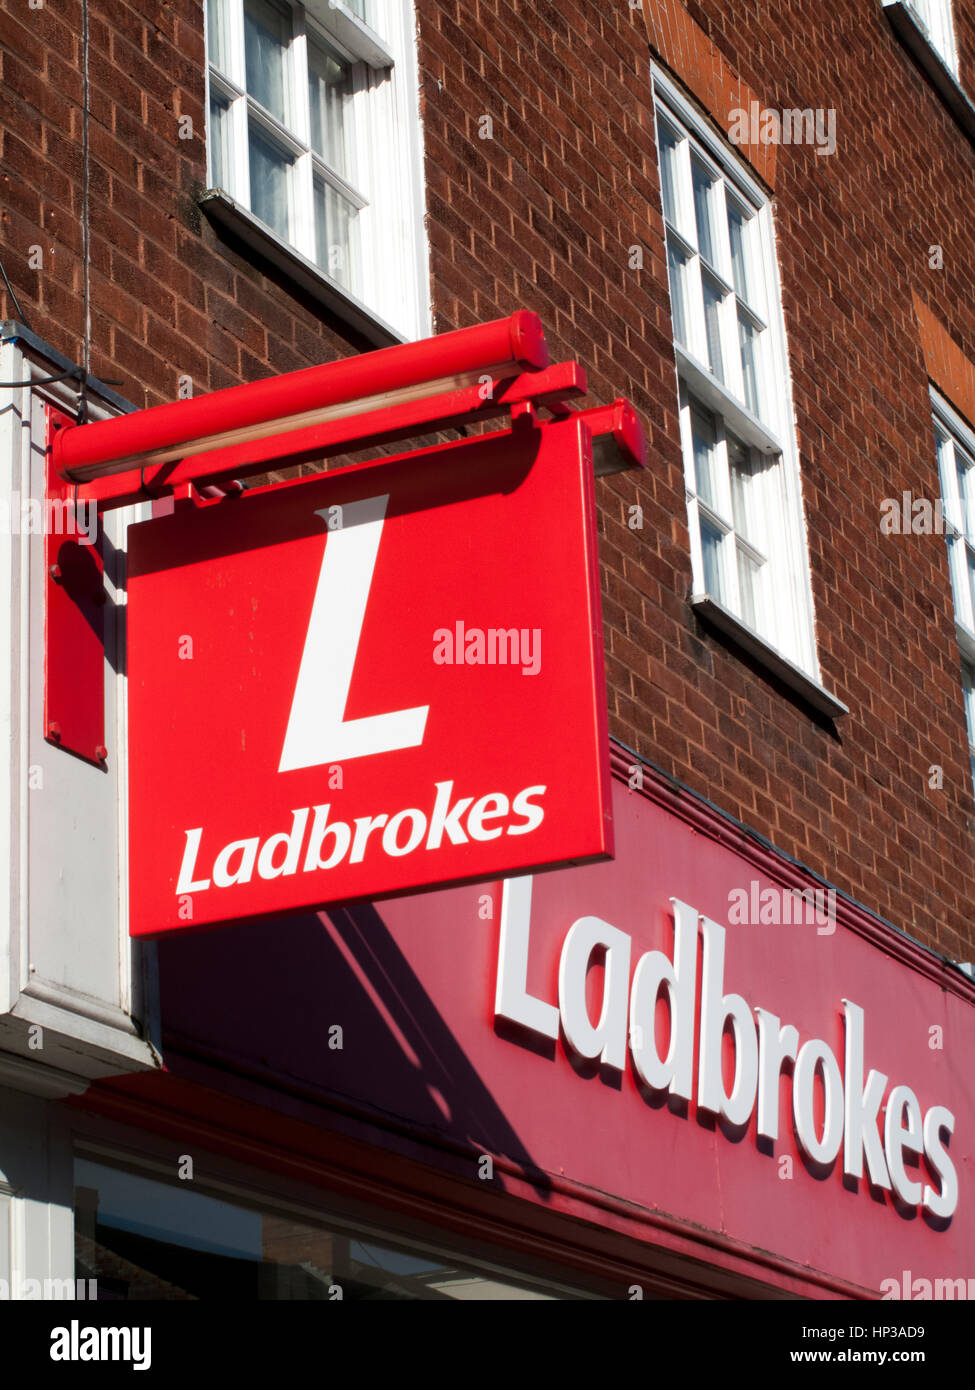 ladbrokes betting and gaming ltd